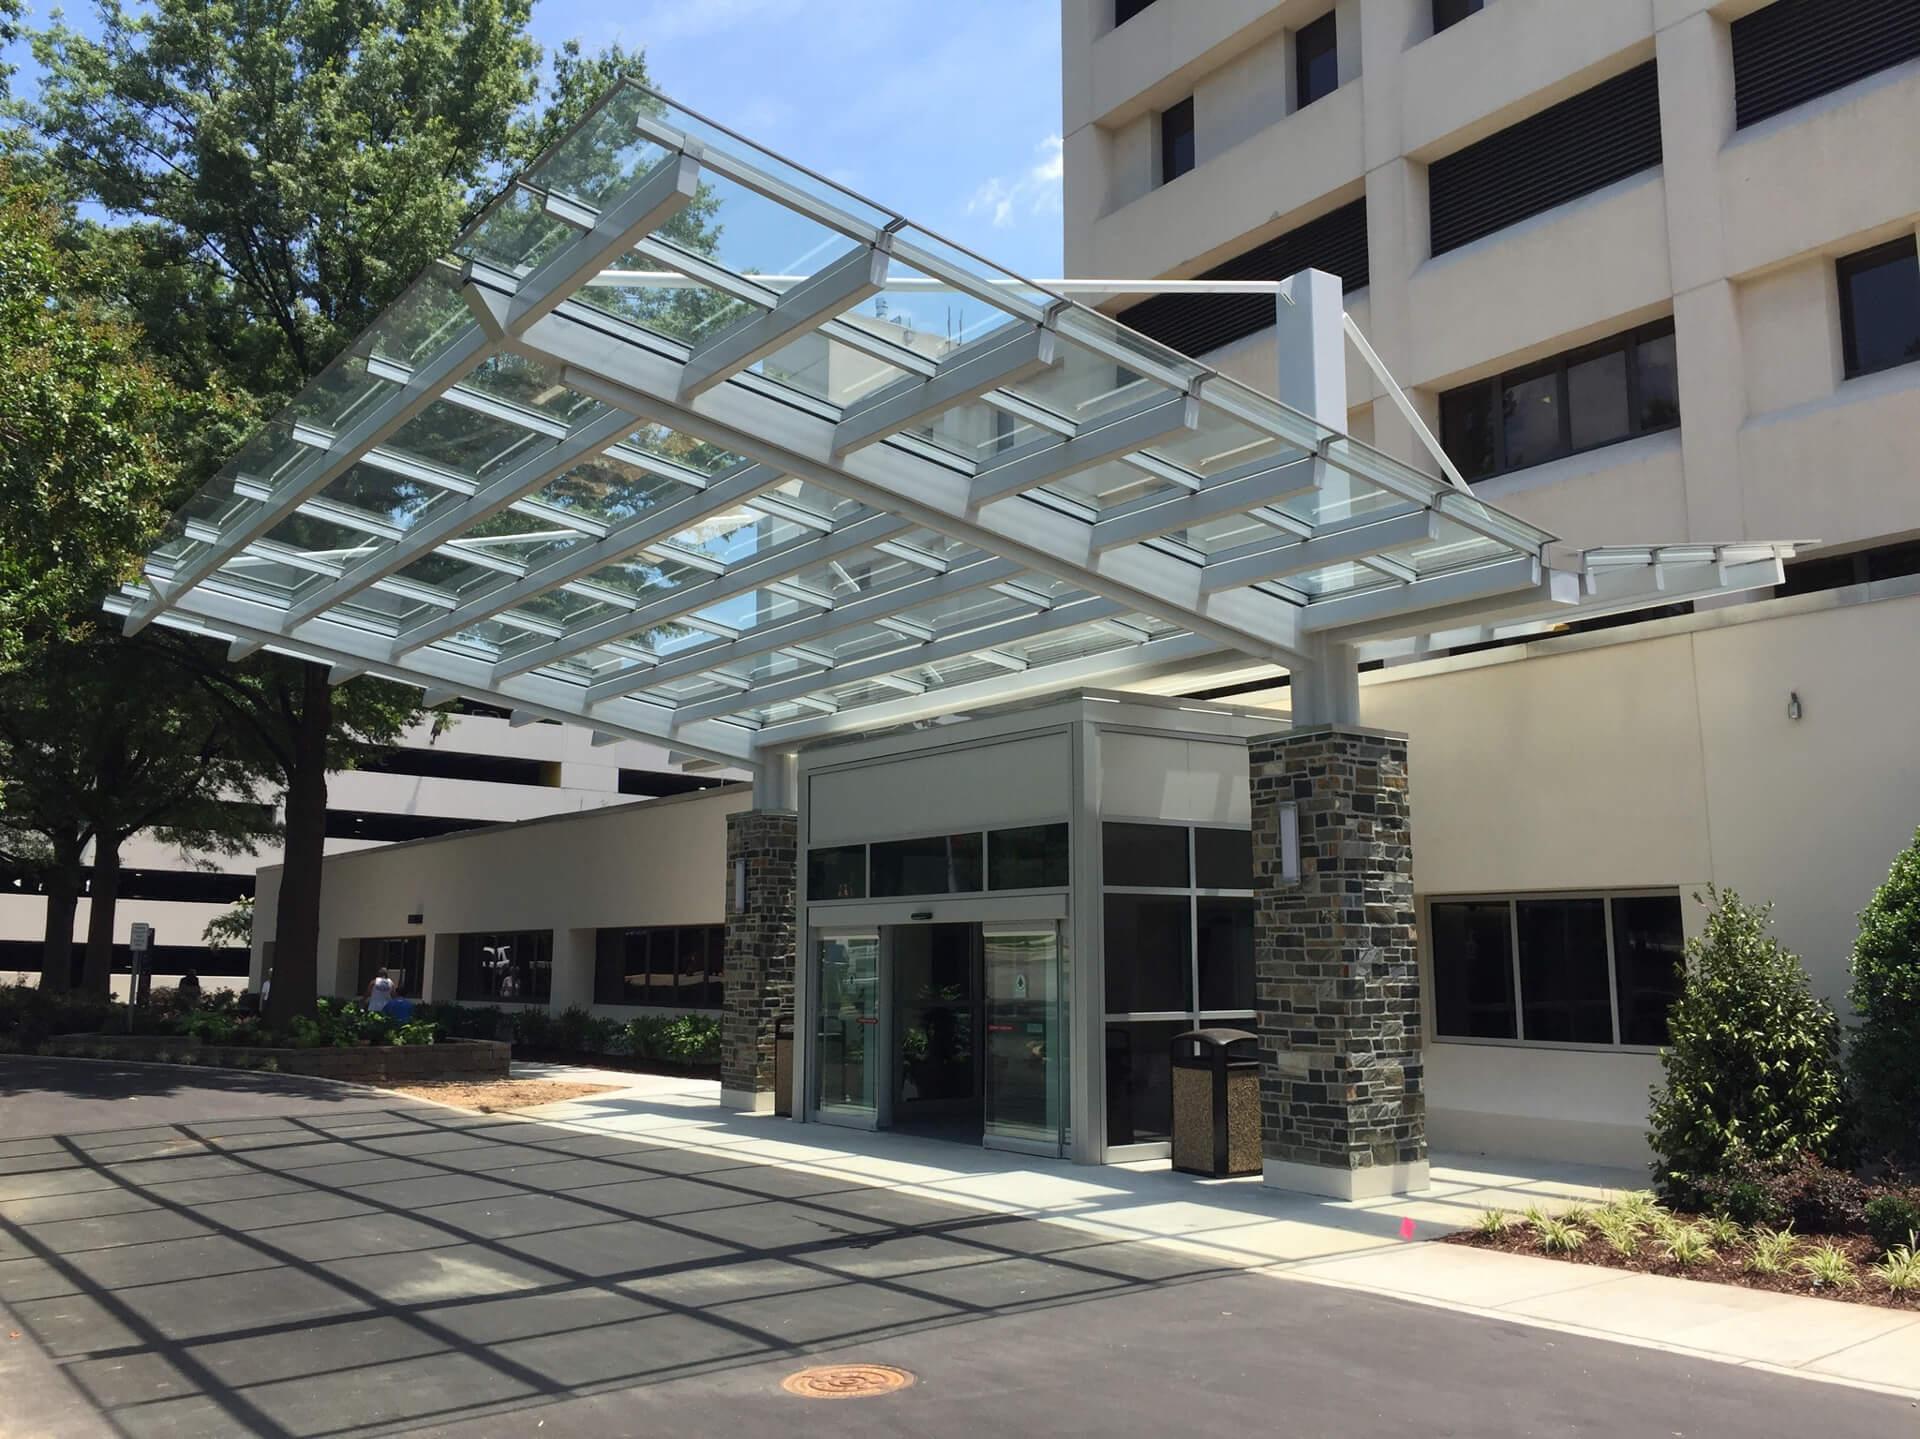 Inofab | – Full Service Custom Canopy Manufacturing Company